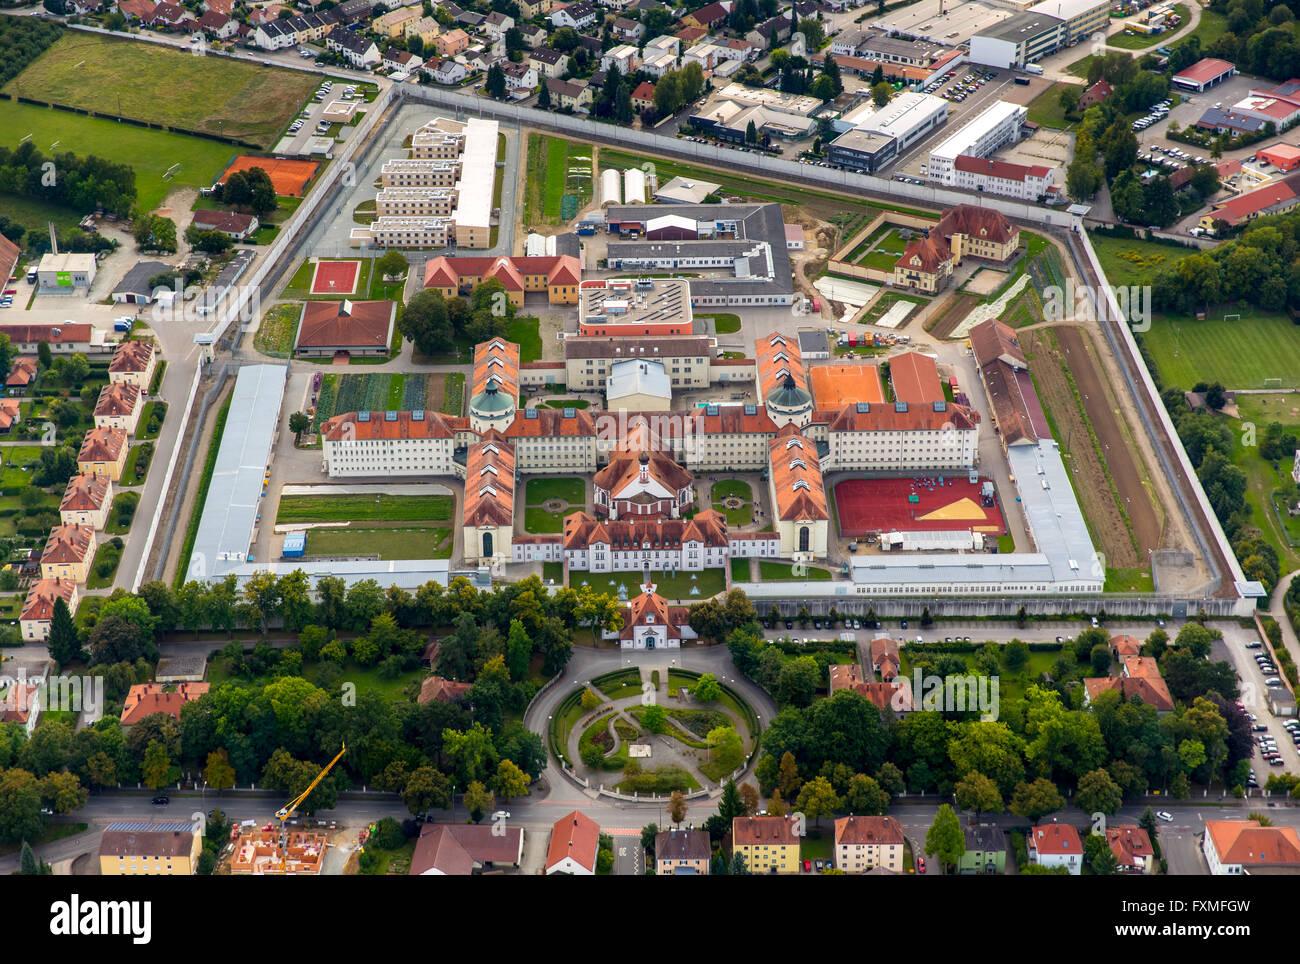 Justizvollzugsanstalt Straubing